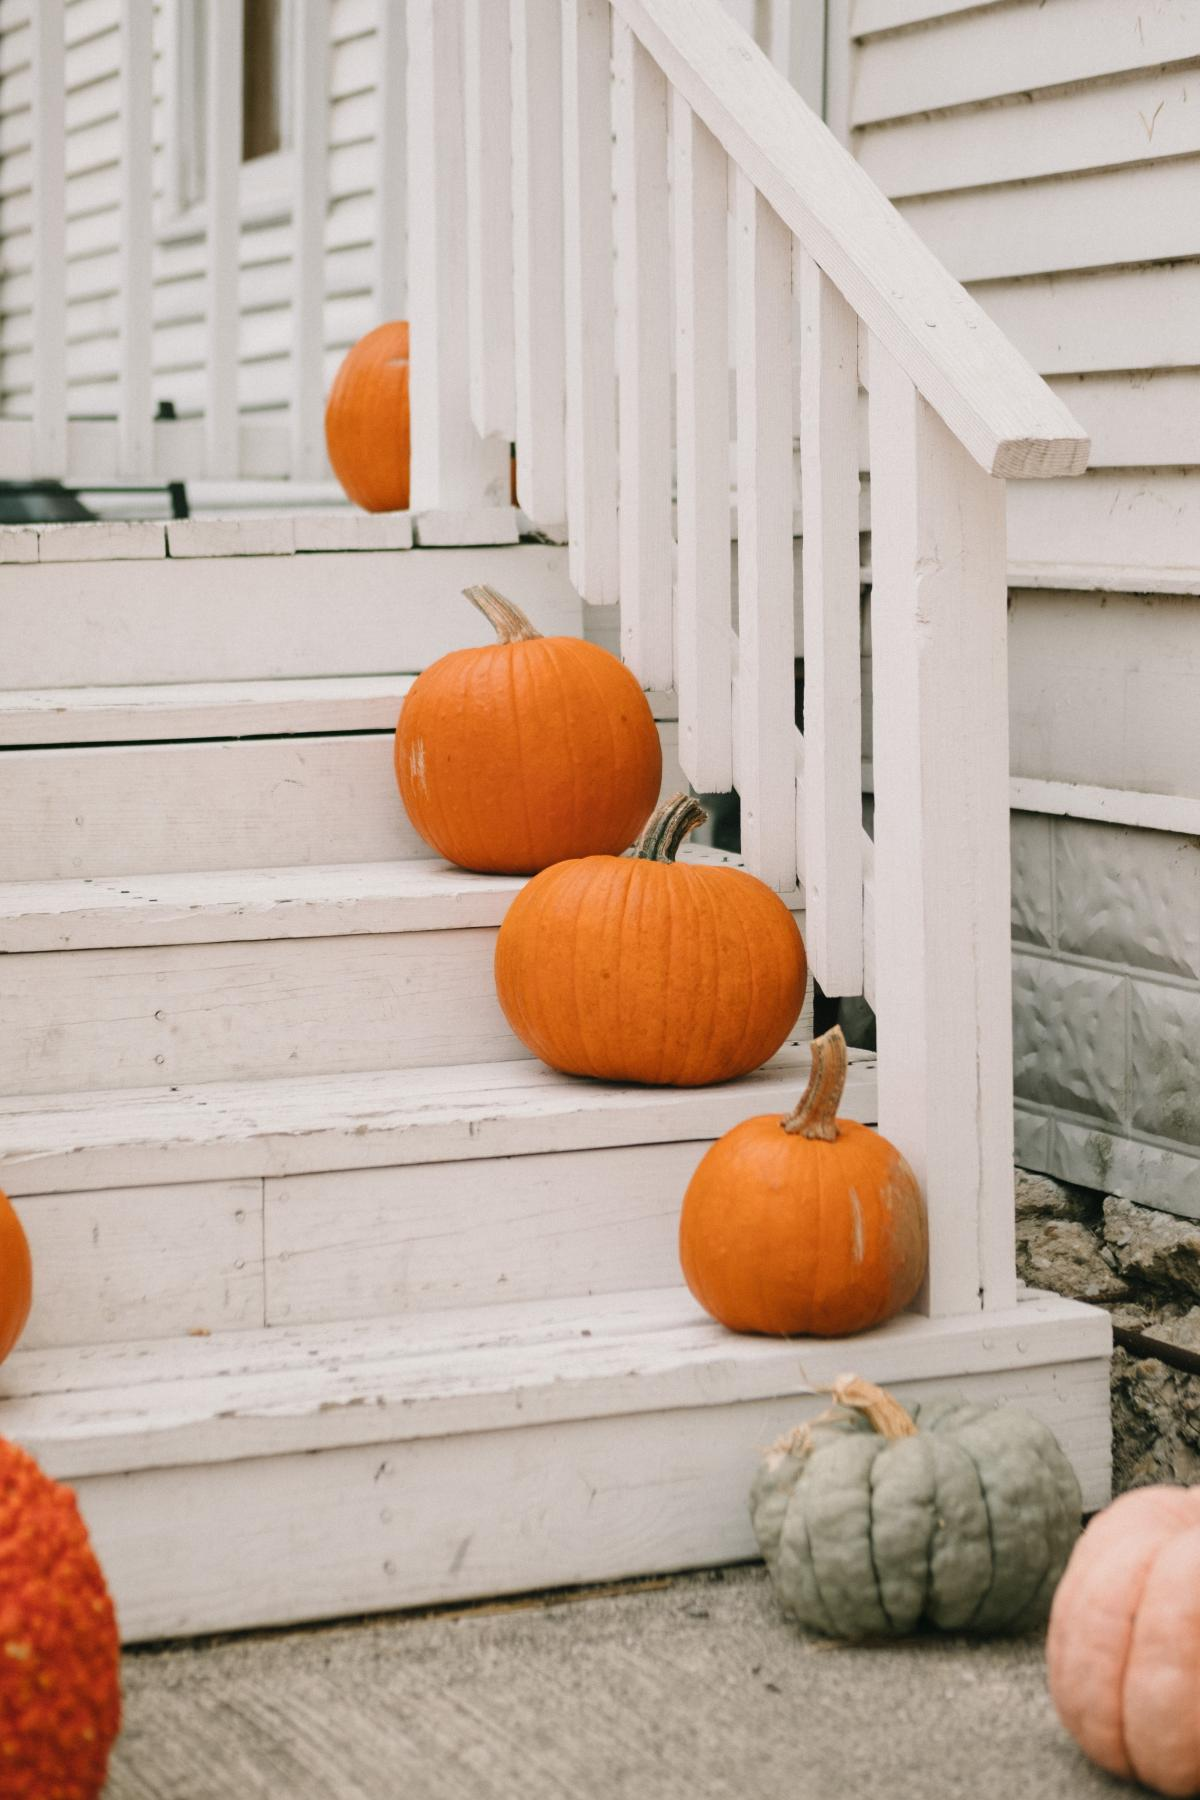 Pumpkin Squash Vegetable #423416